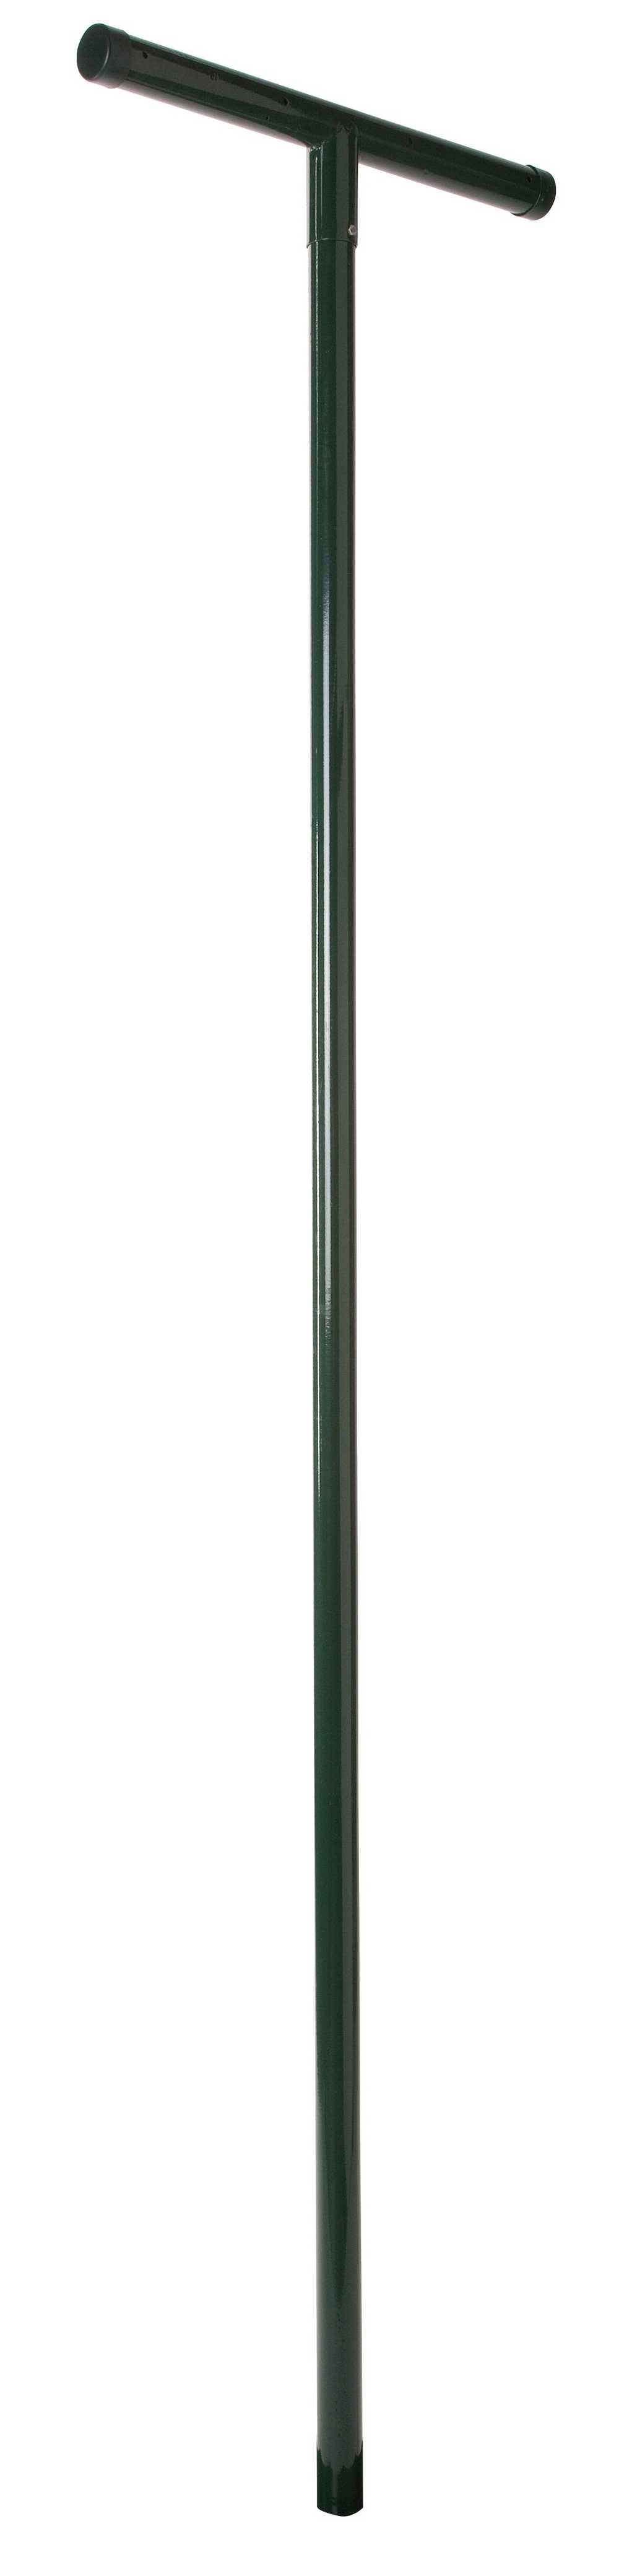 Polyester gepl. Tuinwaspaal 48mm x 240cm RAL 6005 groen